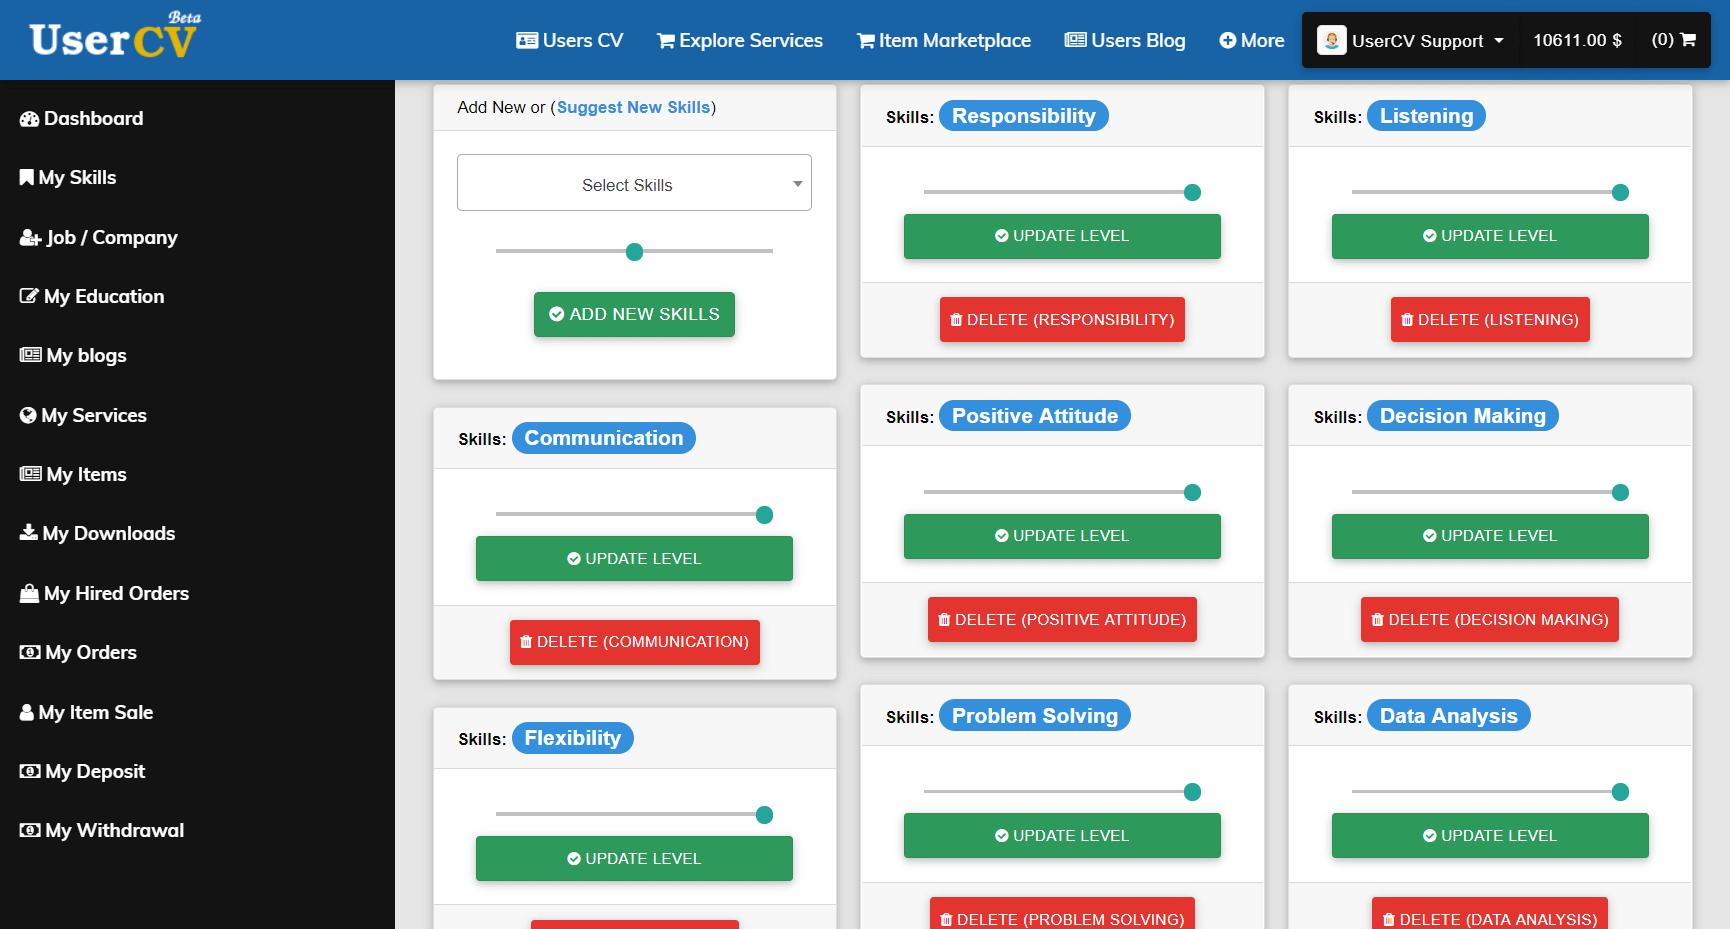 FreelancerCV - Fiverr Clone - Envato Clone - Tumblr Clone - About.me Clone (Multi Domain SAAS) - Add skills page